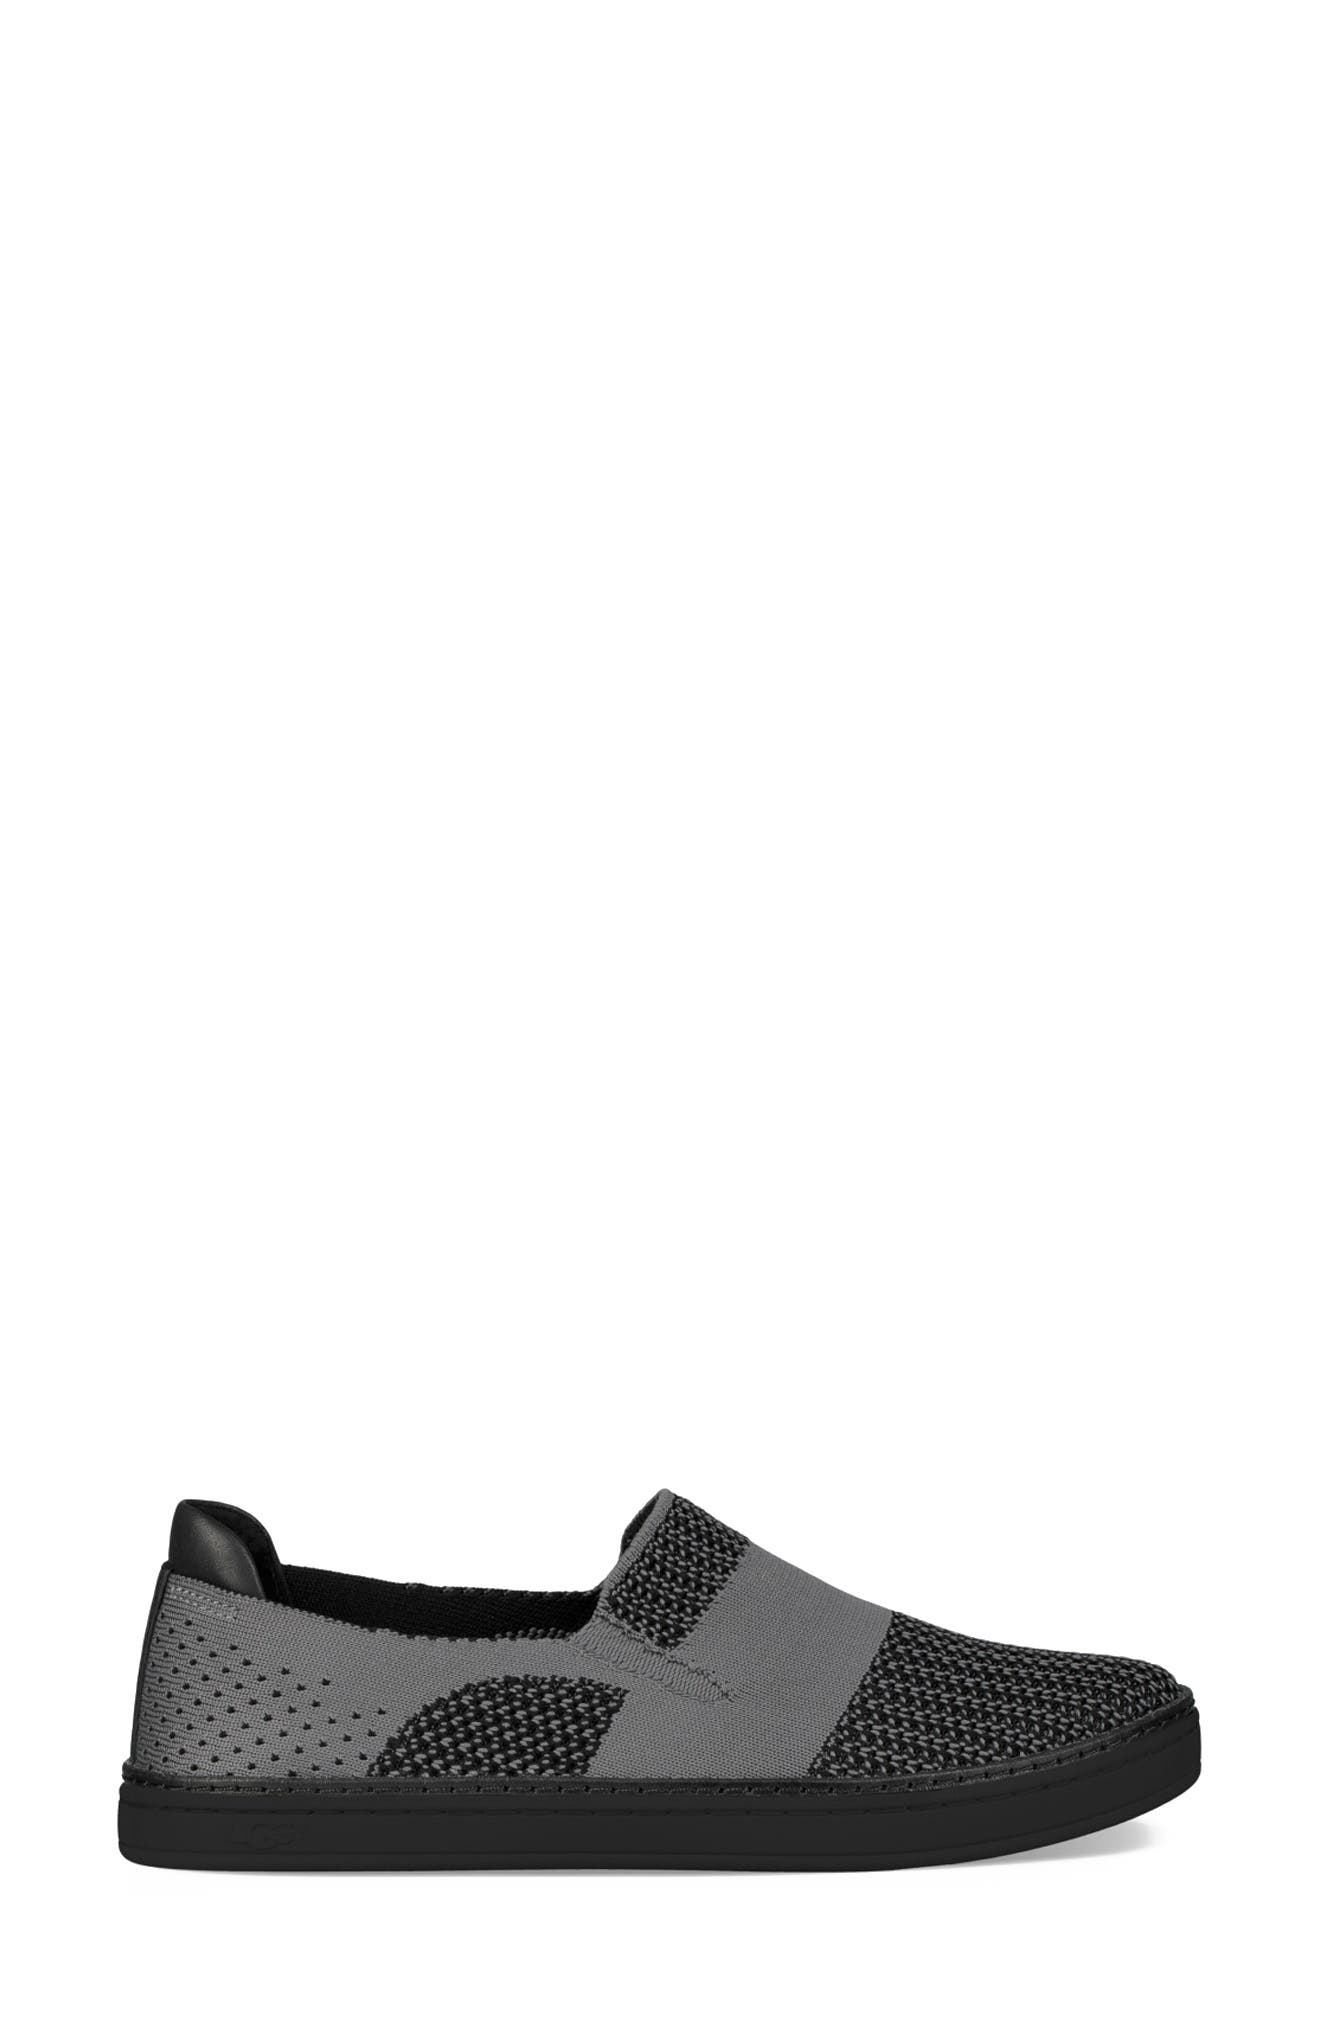 Sammy Sneaker,                             Alternate thumbnail 3, color,                             BLACK/ BLACK FABRIC